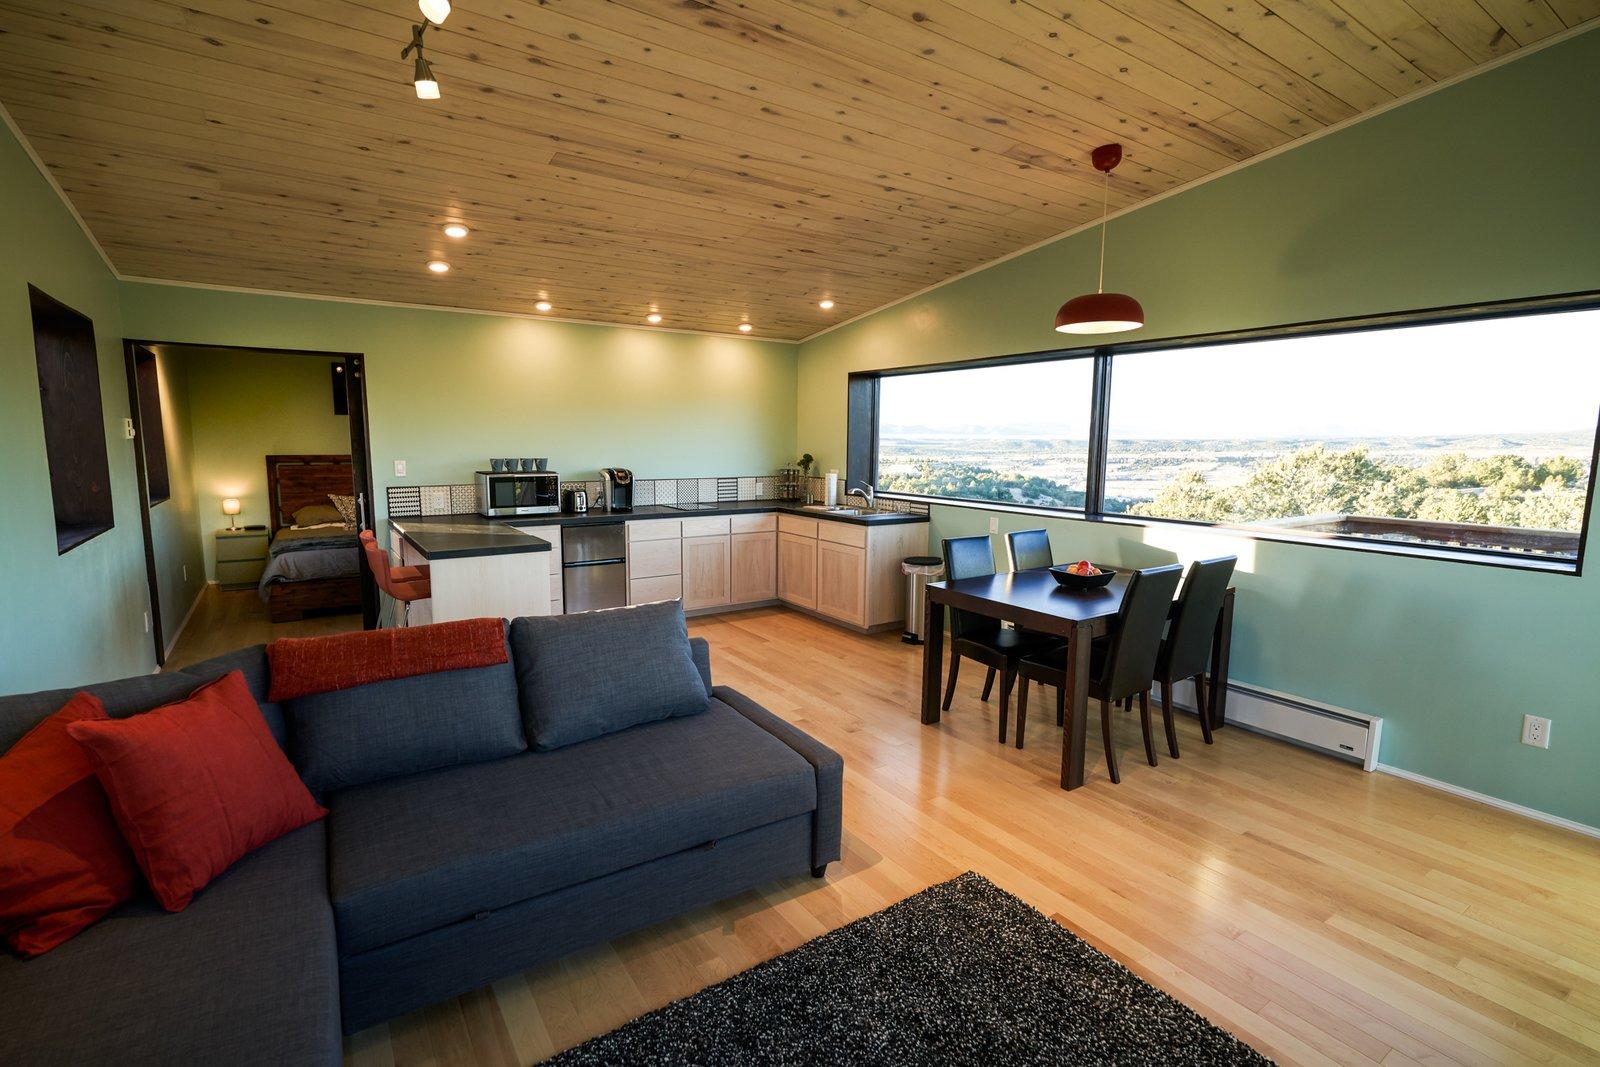 Living Room and Light Hardwood Floor  SkyNest by Joaquin Karcher